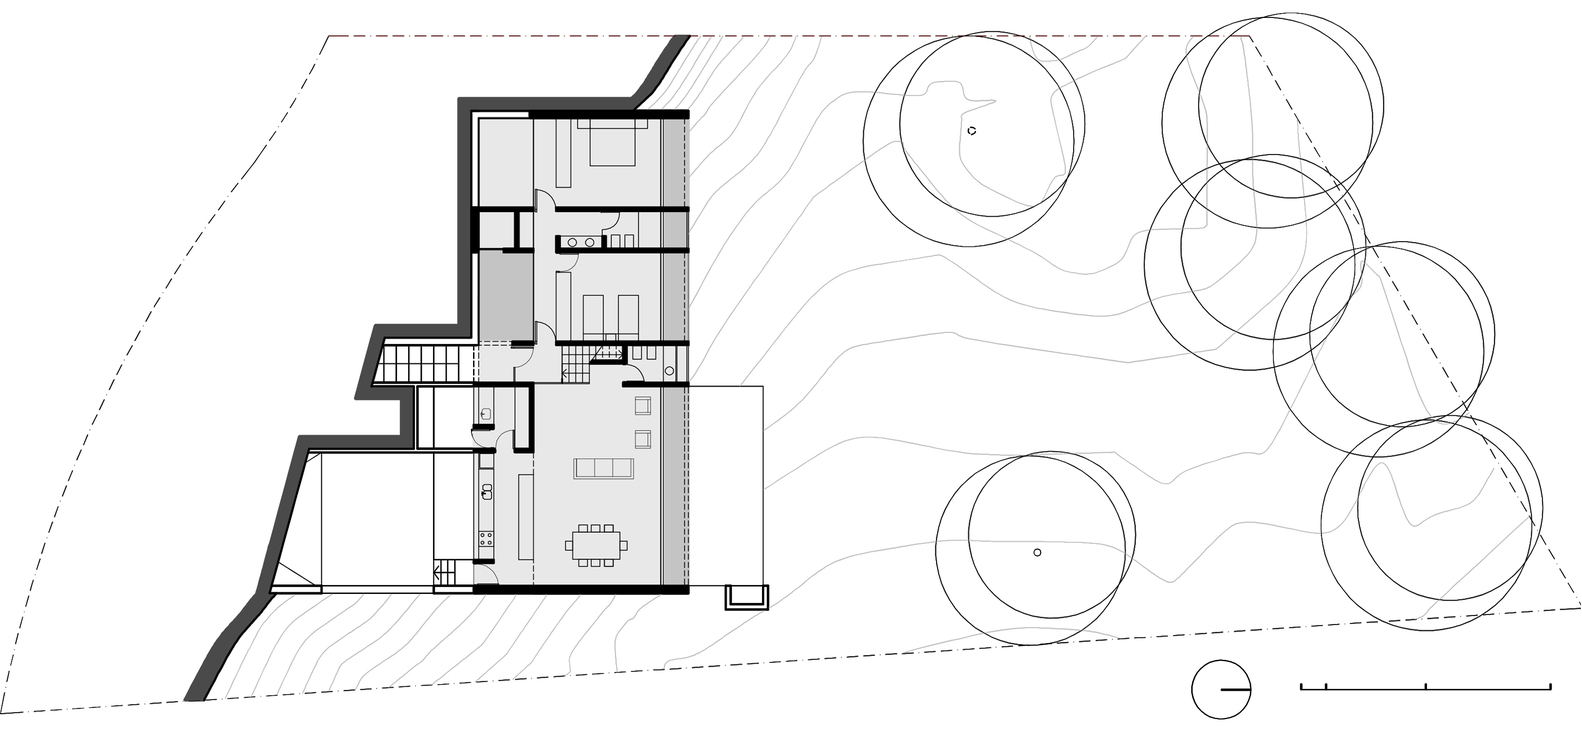 gpl house floor plan image